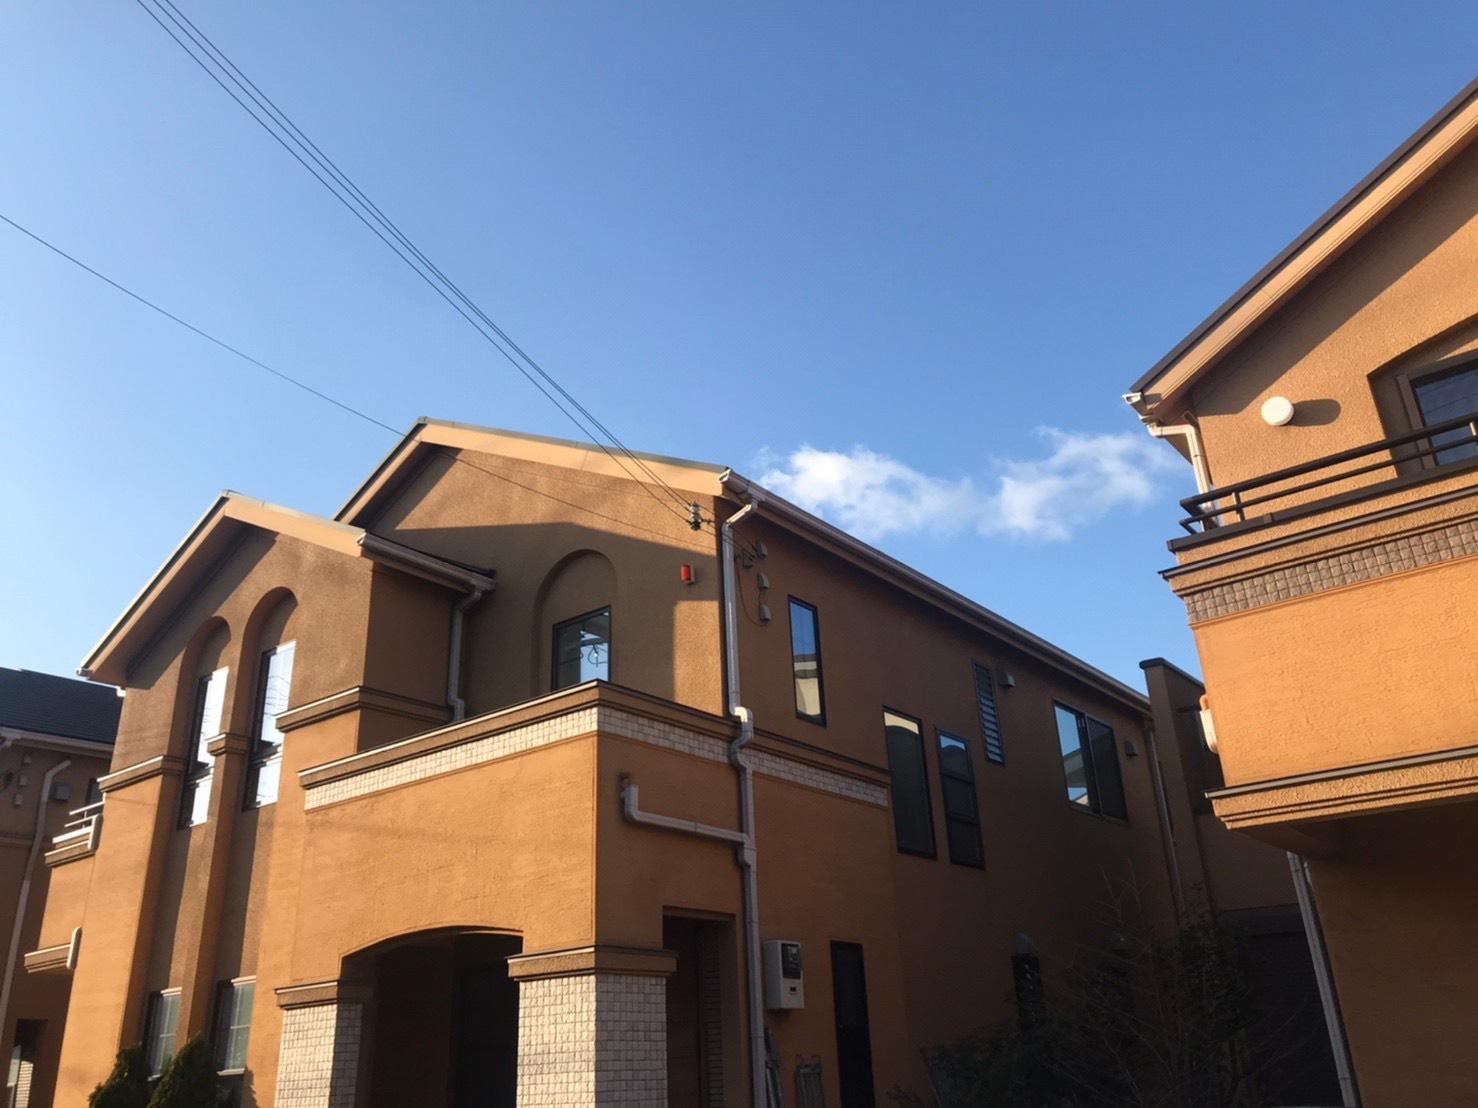 大阪市淀川区Y様邸外壁塗装工事、屋根壁ベランダ防水工事 - BEFORE